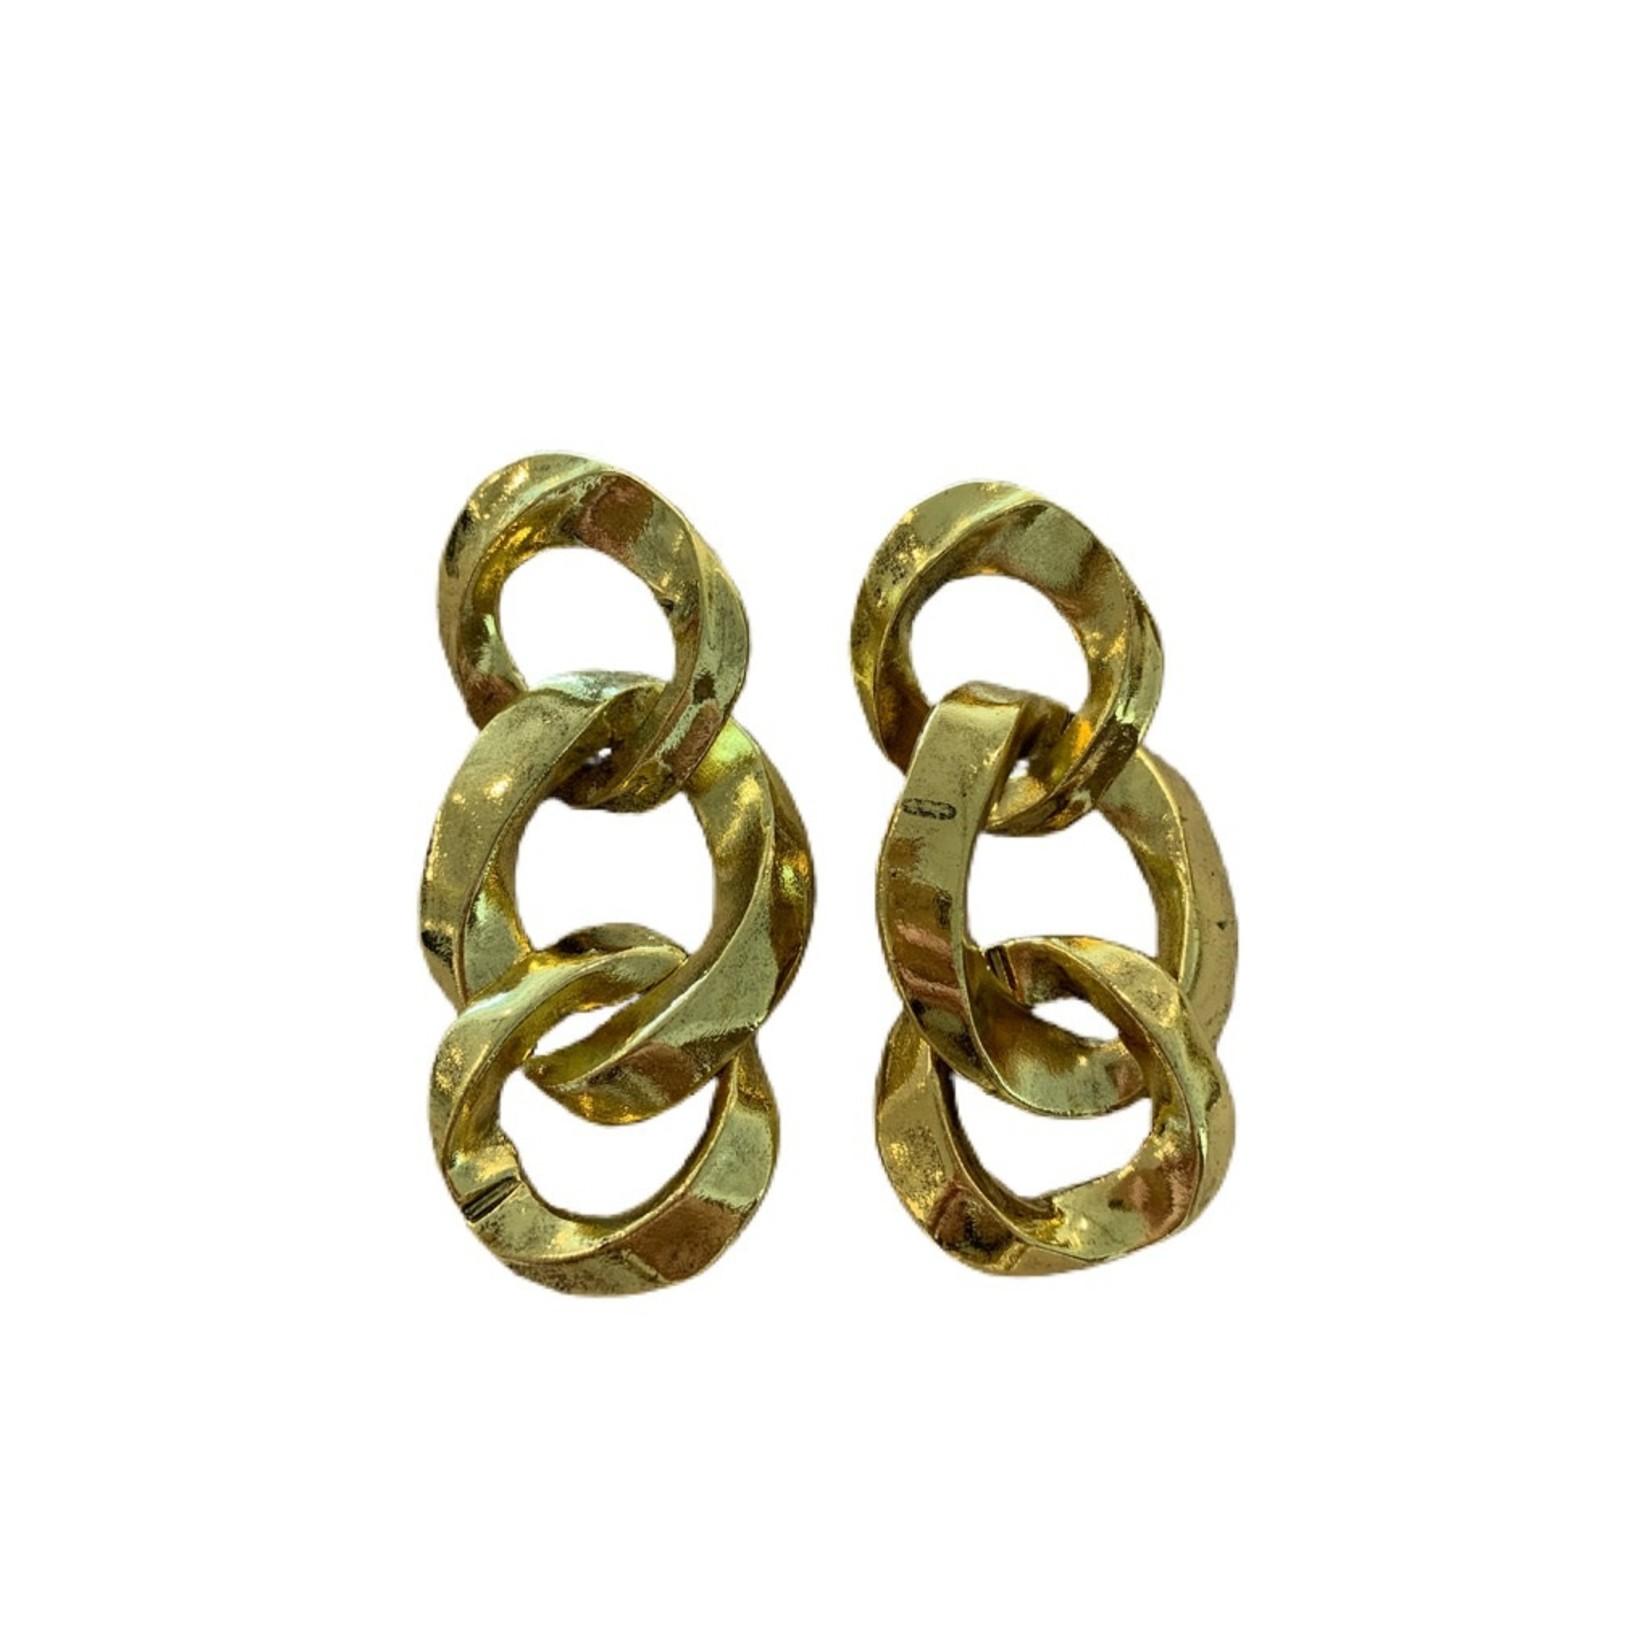 Wyld Blue Chunky Chain Link Earrings